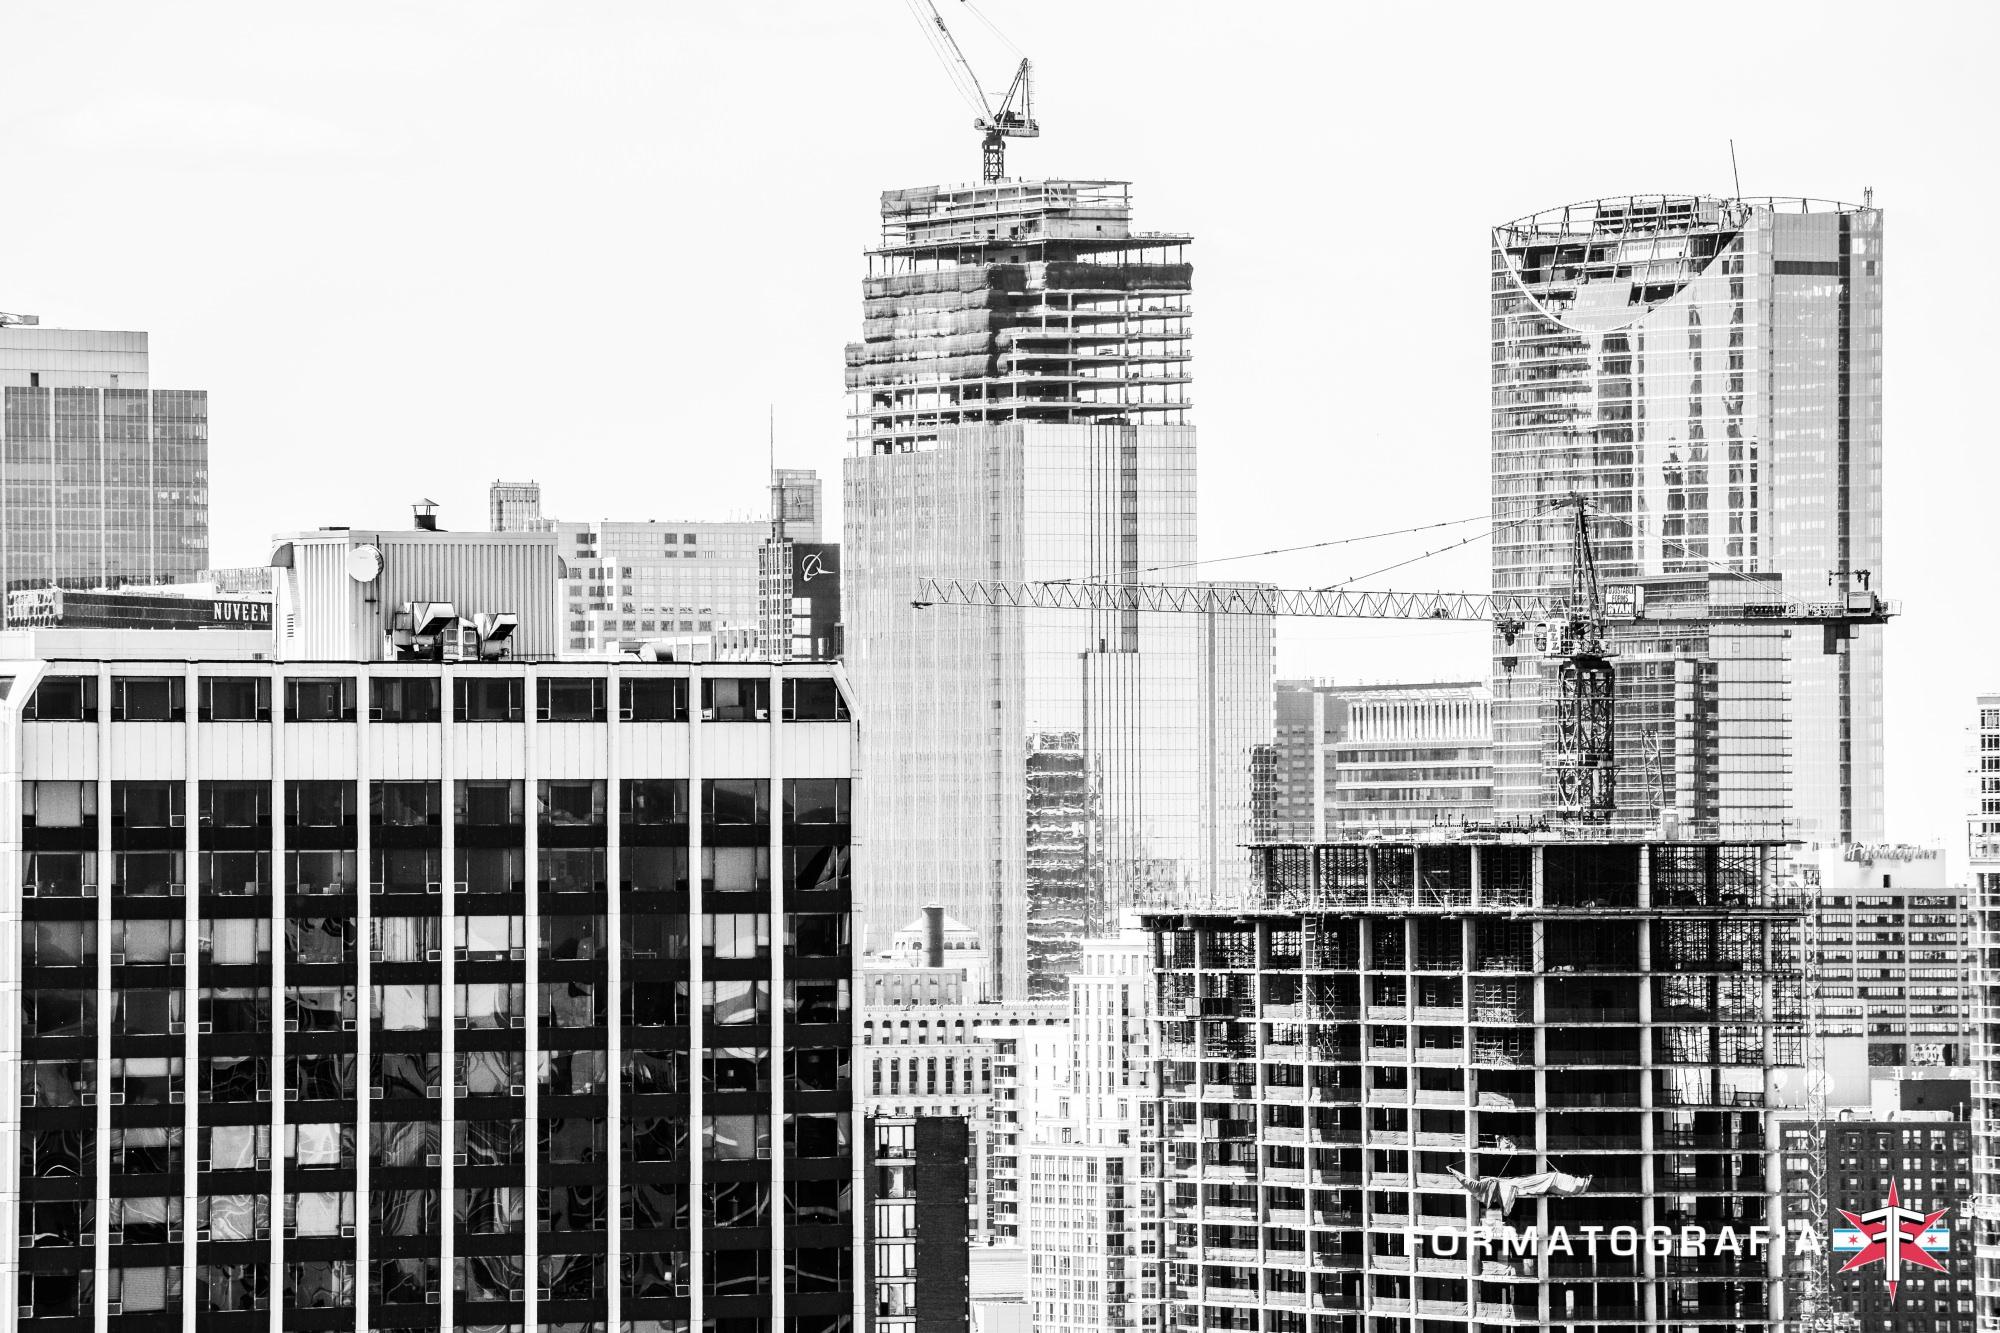 eric formato chicago photographer fall update city architecture shotsDSC_0673-3.jpg